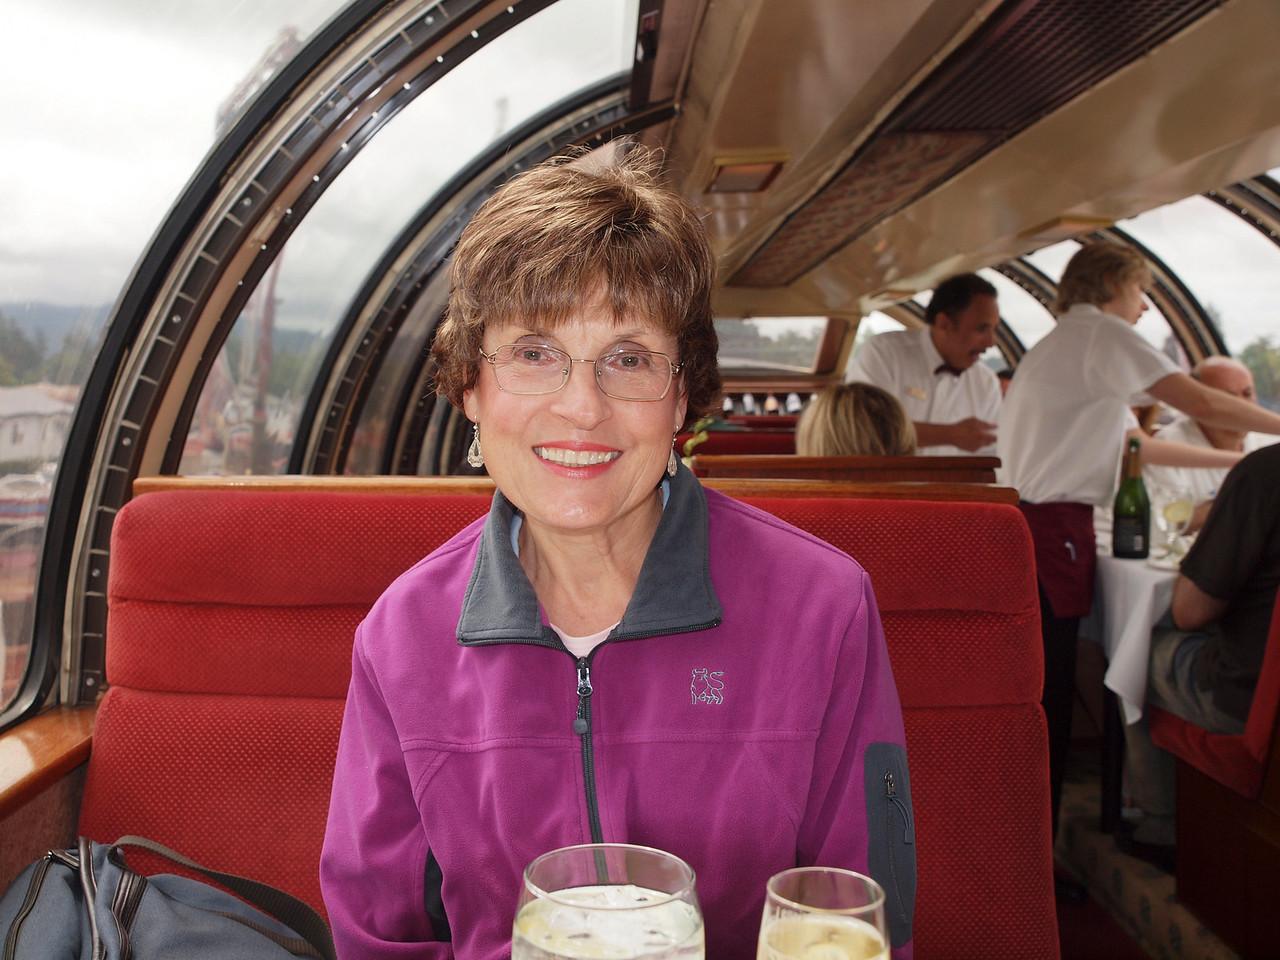 Katherine on the Napa Valley Wine Train.